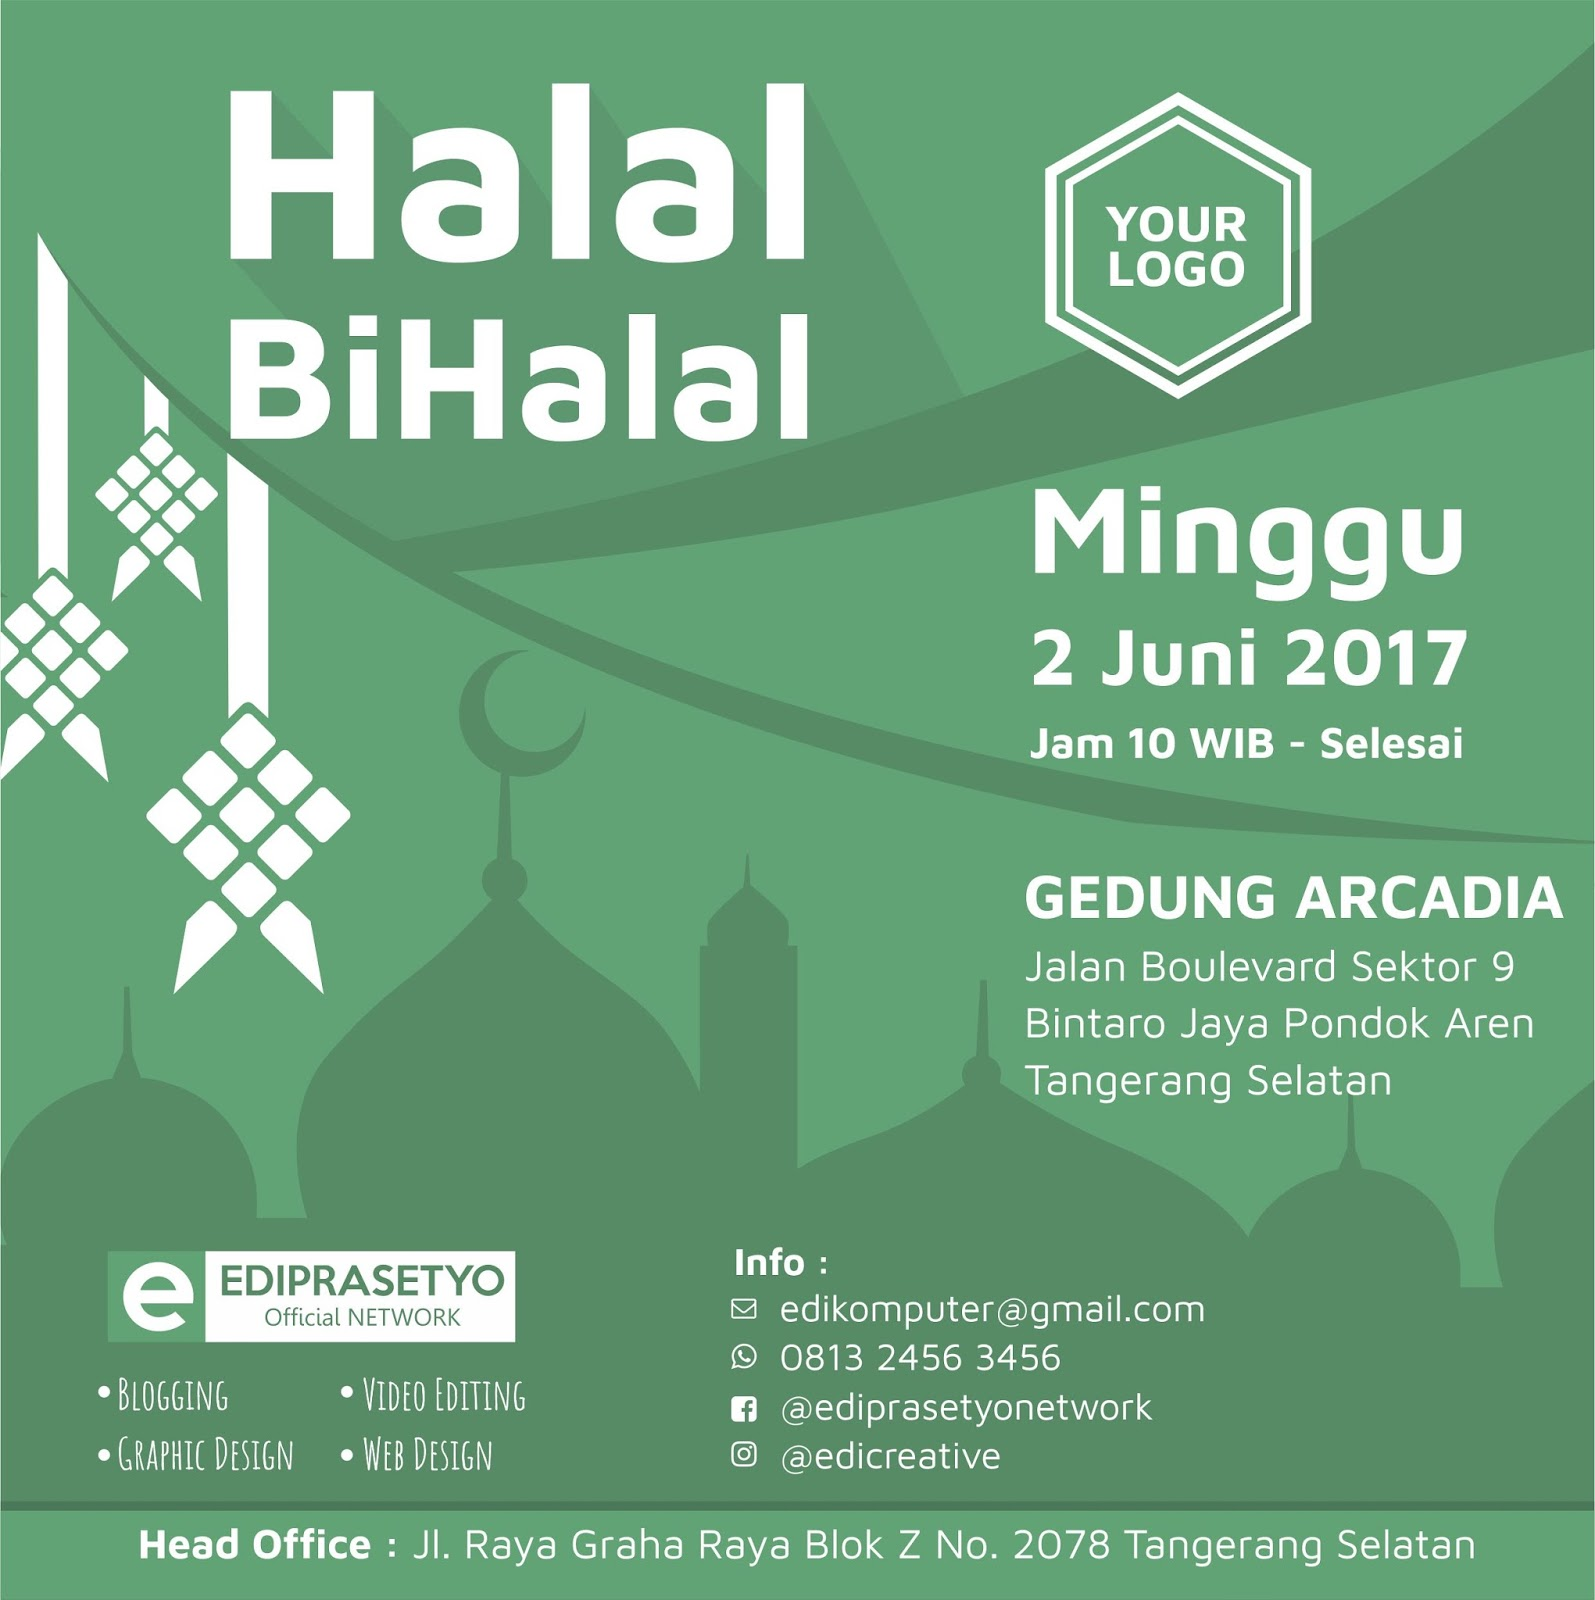 Download Desain Poster Halal Bi Halal 2017 Gratis Edi Prasetyo